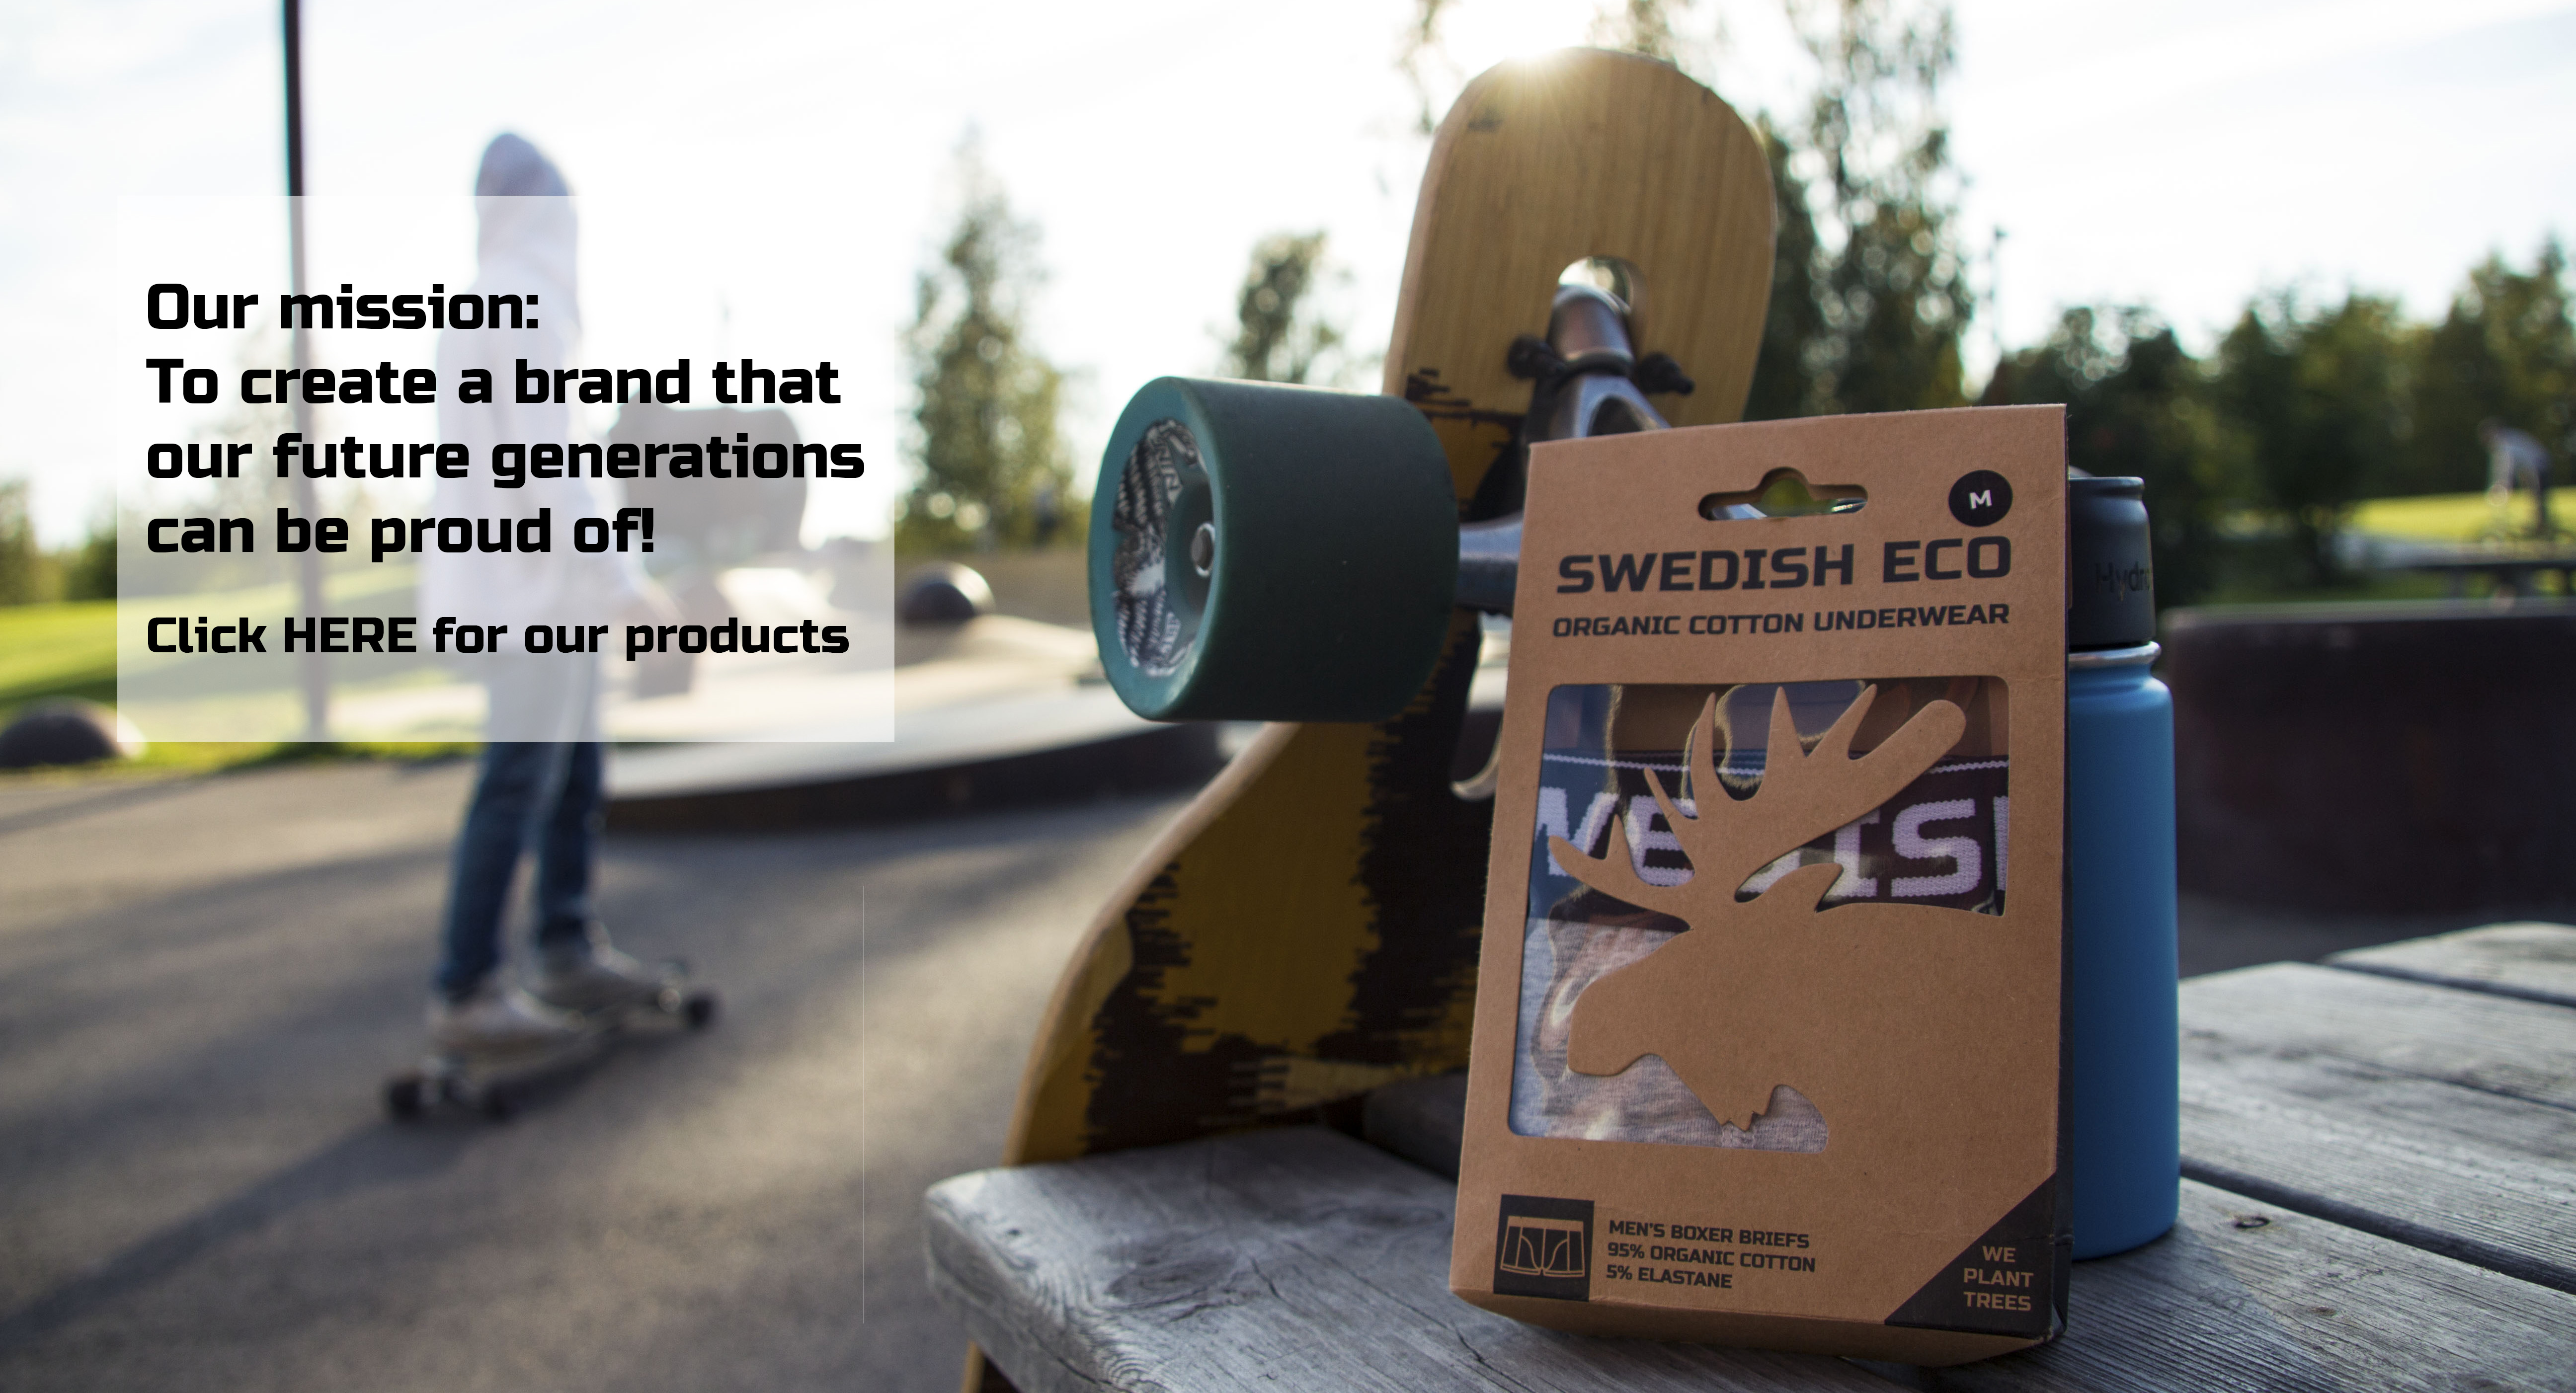 Swedish Eco framsida